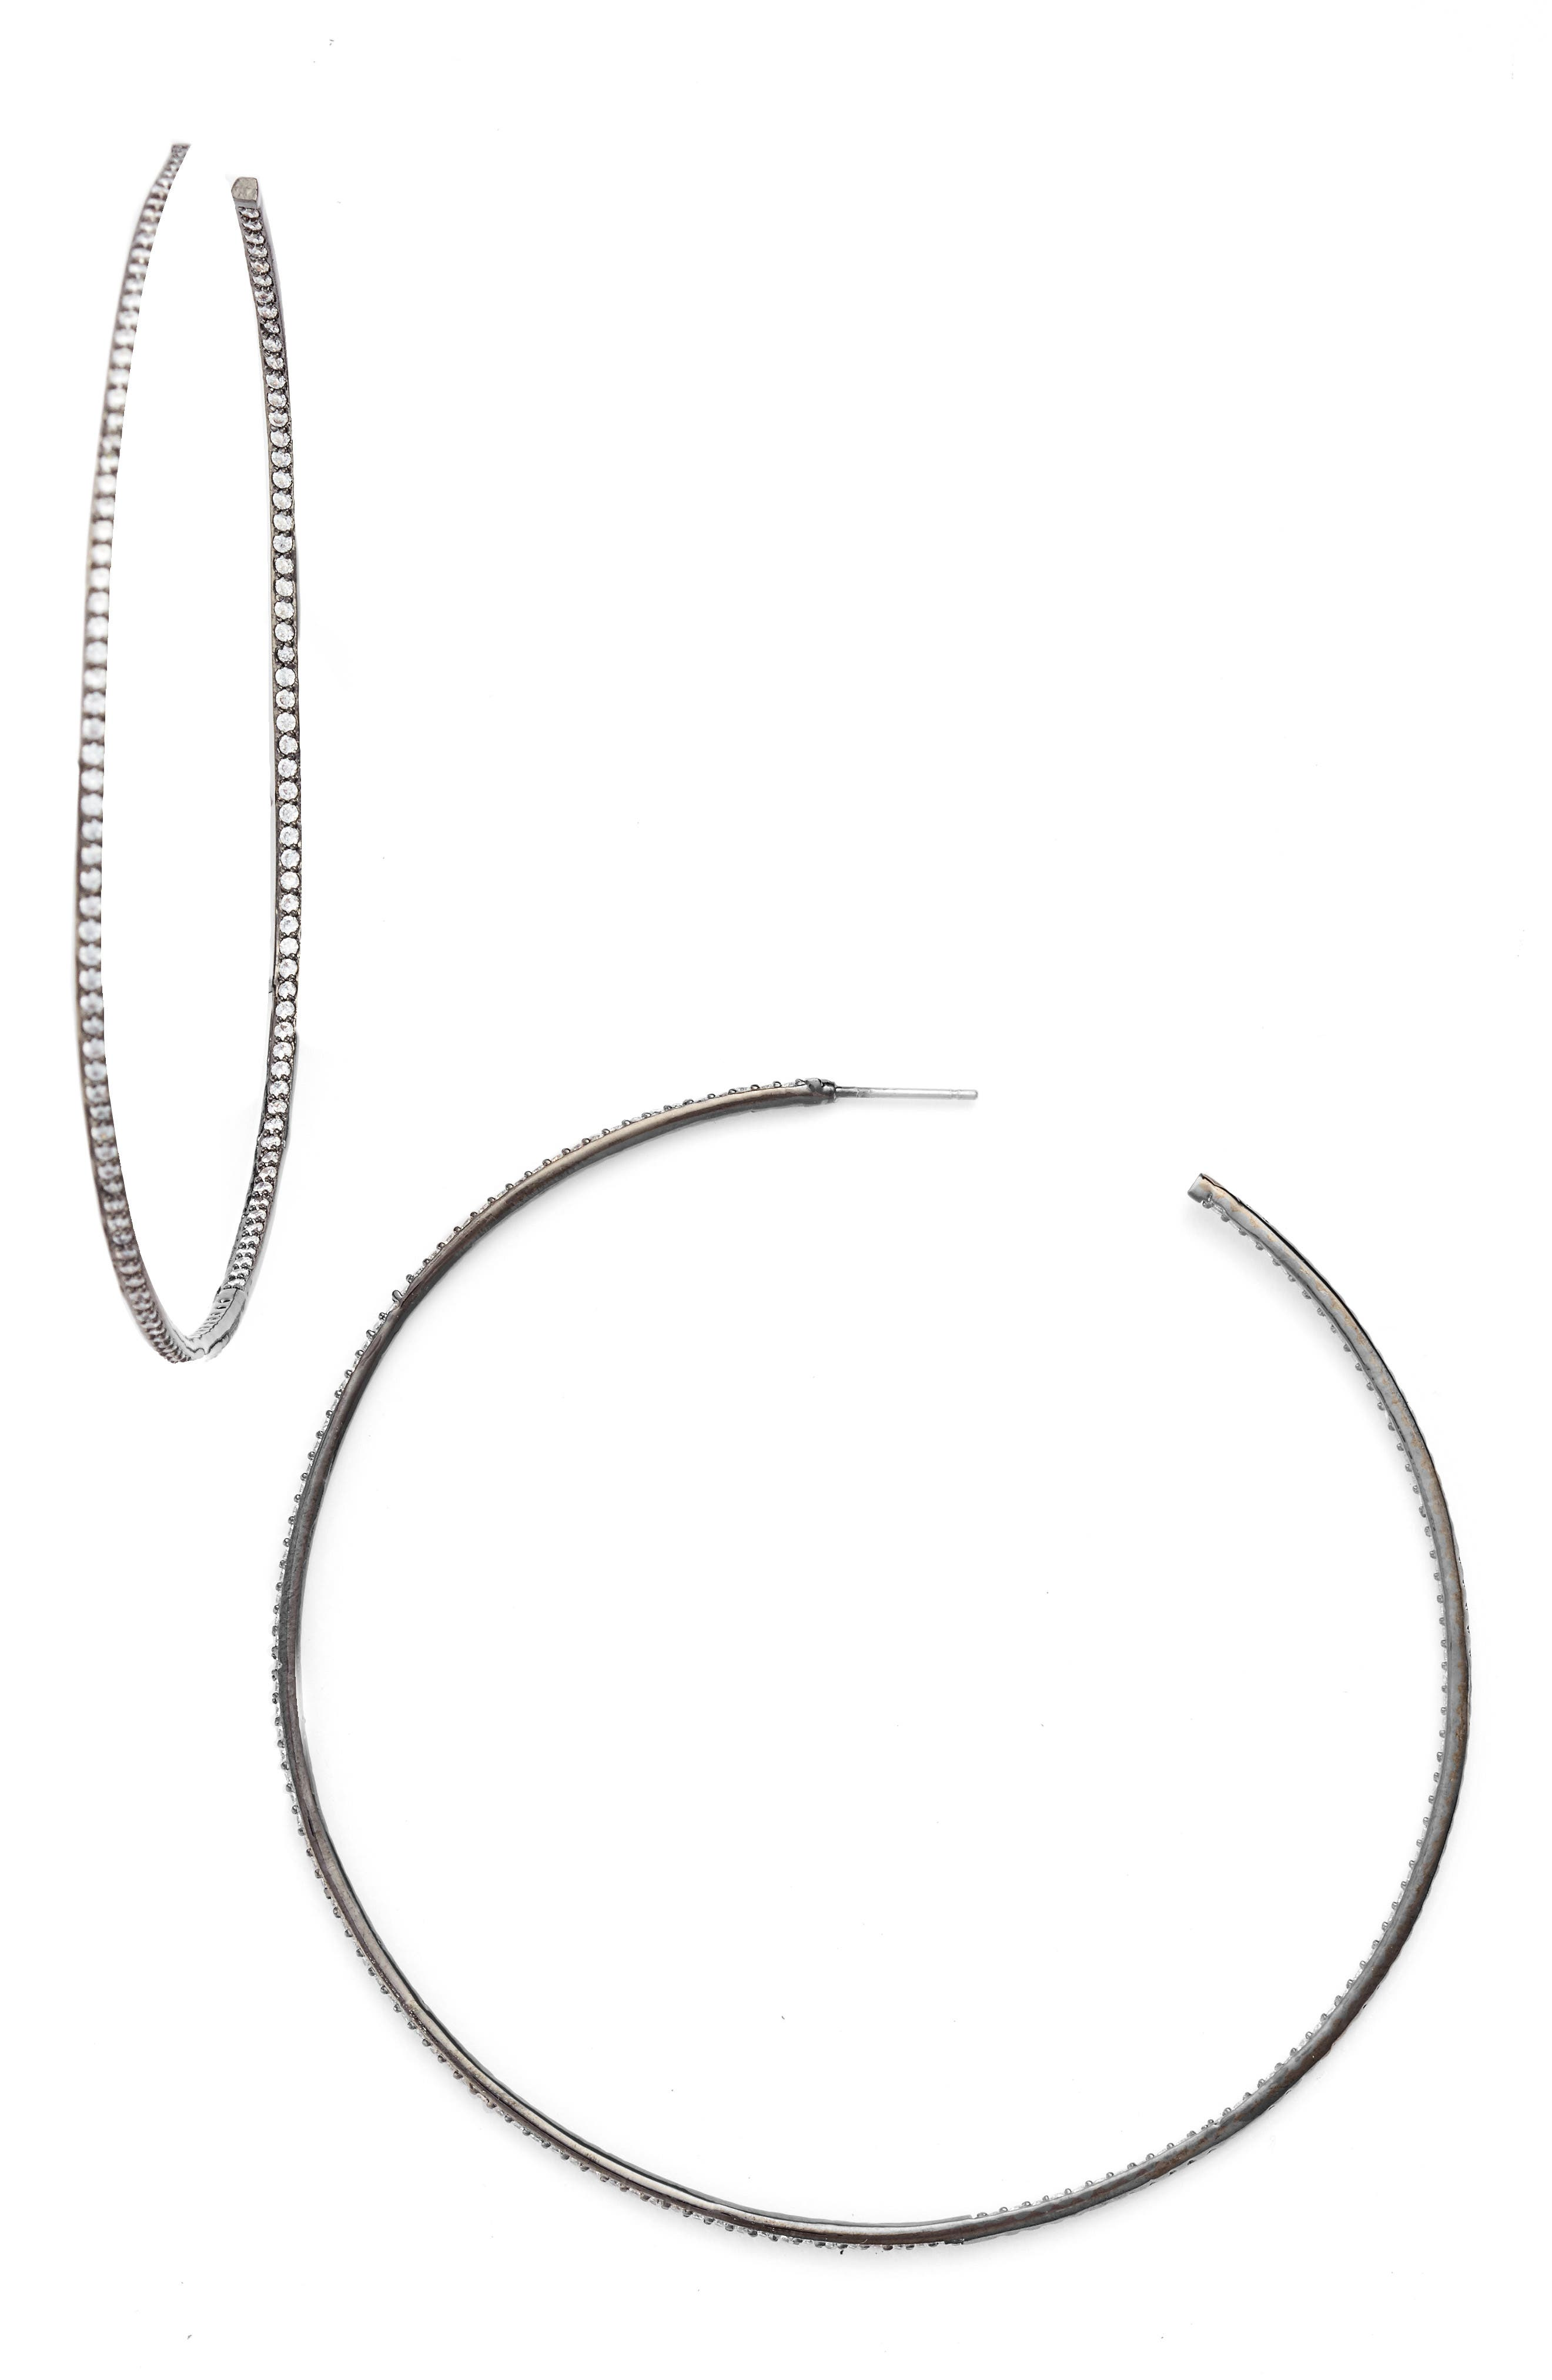 Main Image - CZ by Kenneth Jay Lane Skinny Inside Out Hoop Earrings